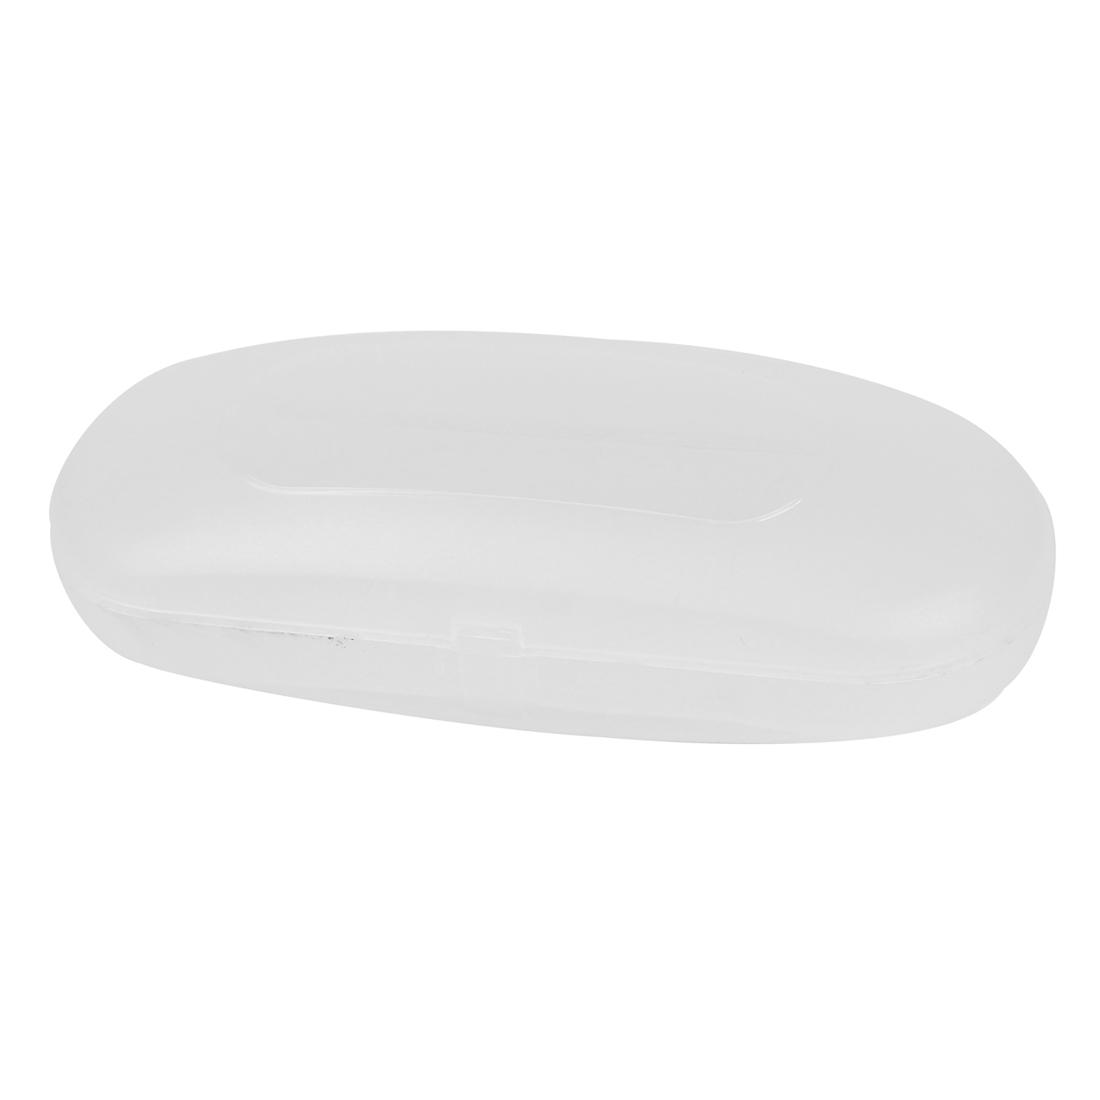 Portable Hard Plastic Plain Glasses Case Eyewear Clear White